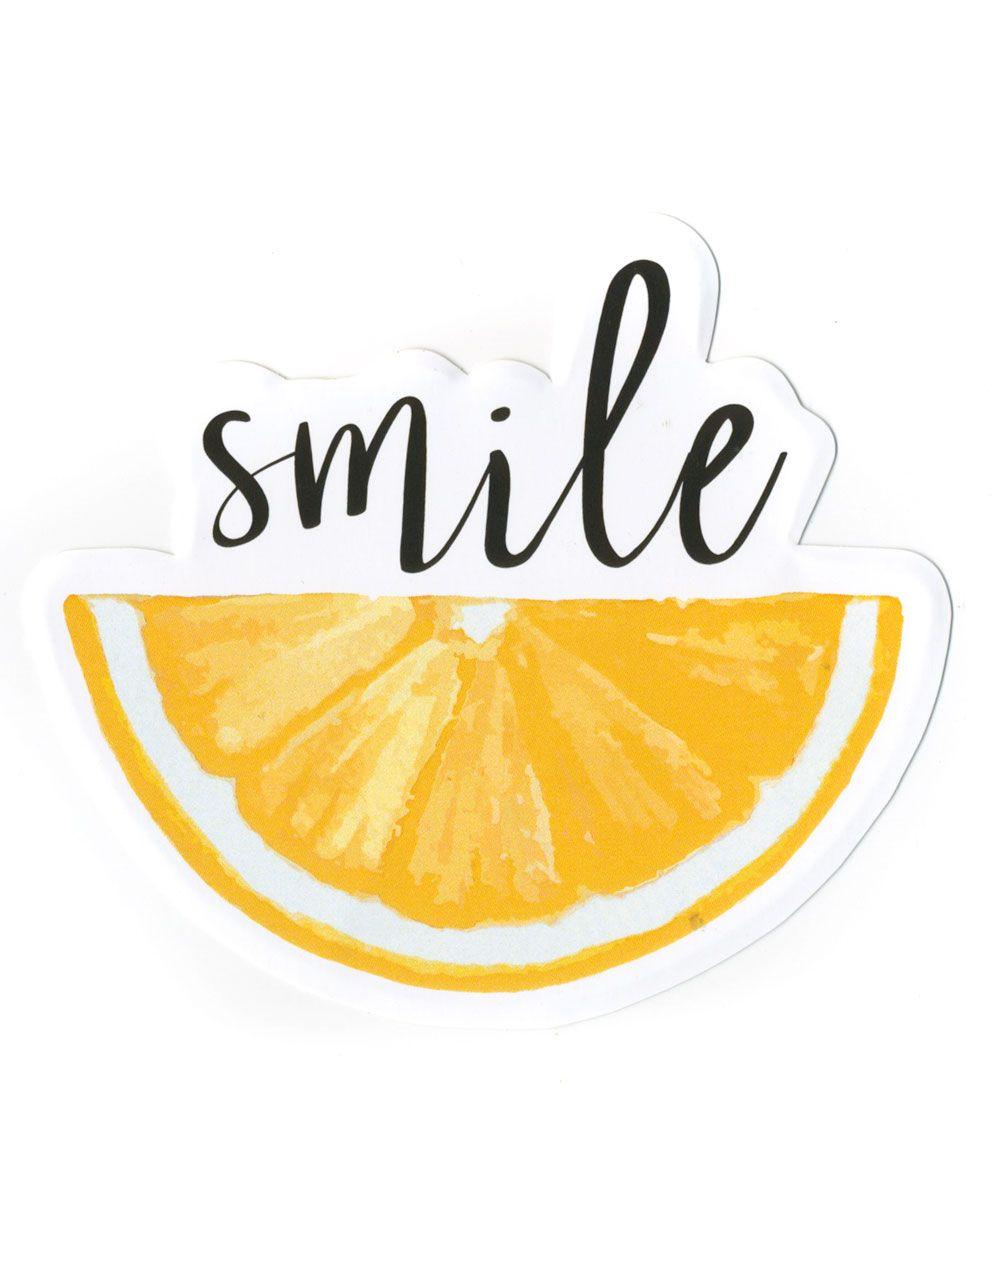 Smile Lemon sticker. Approx. dimensions: 4